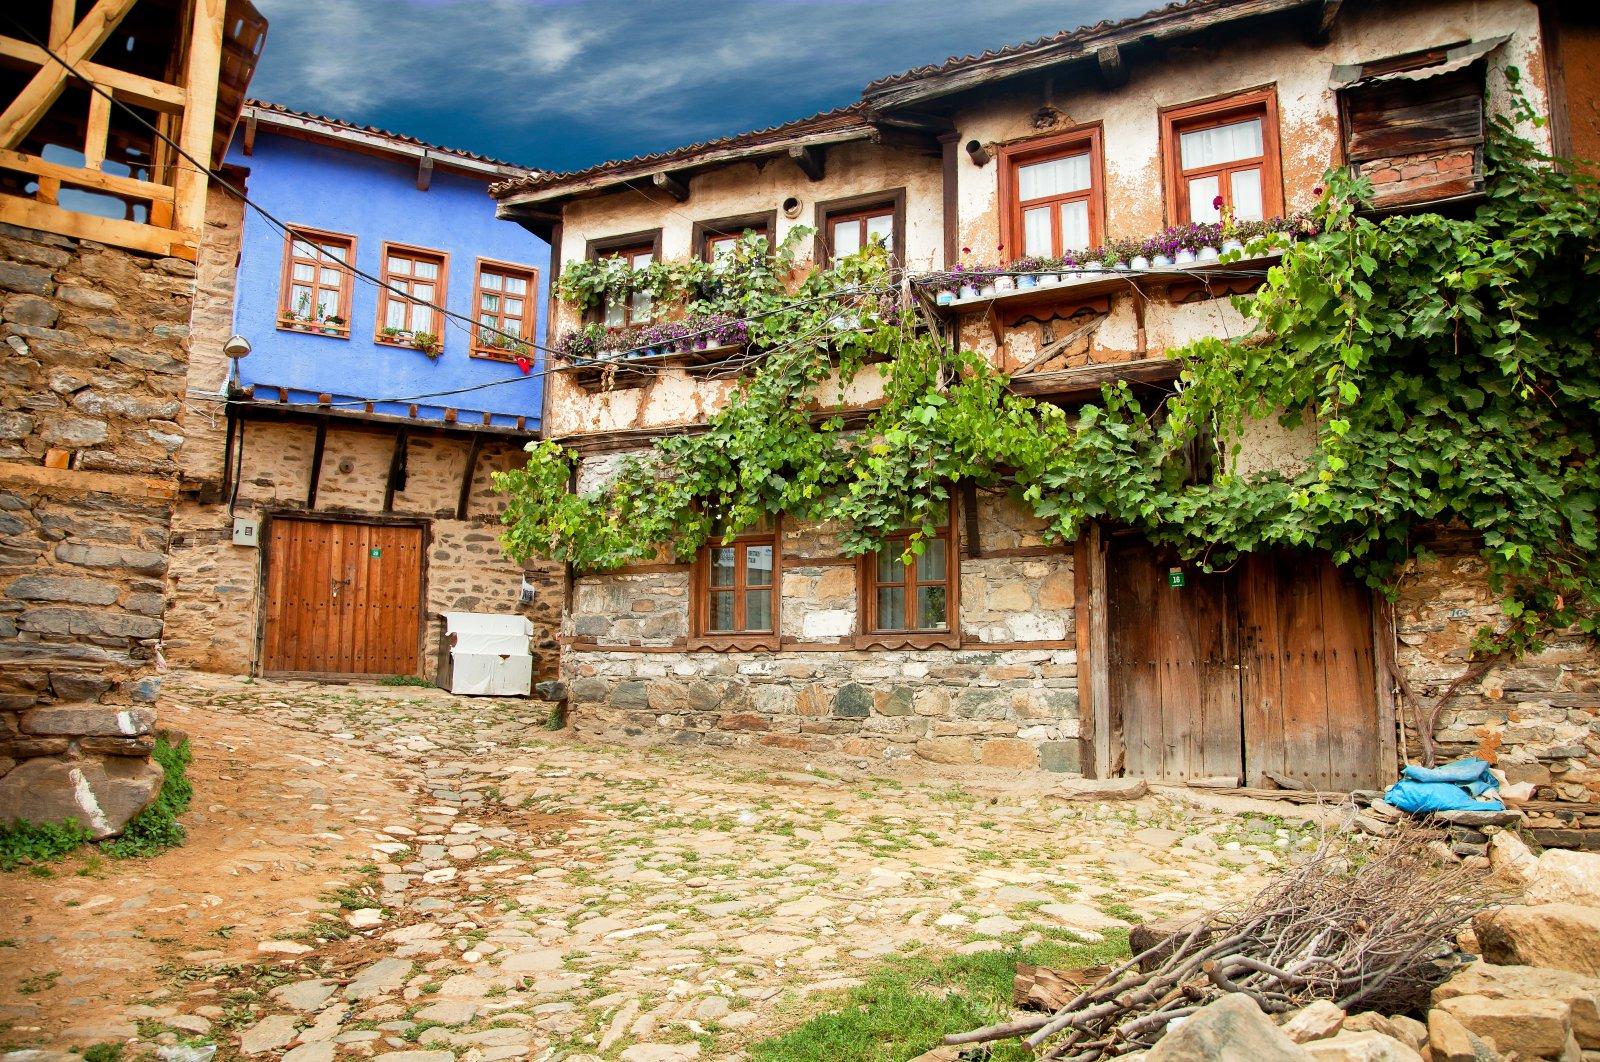 A view from the Cumalıkızık village, Bursa, northwestern Turkey, September 13, 2016. (Shutterstock Photo)